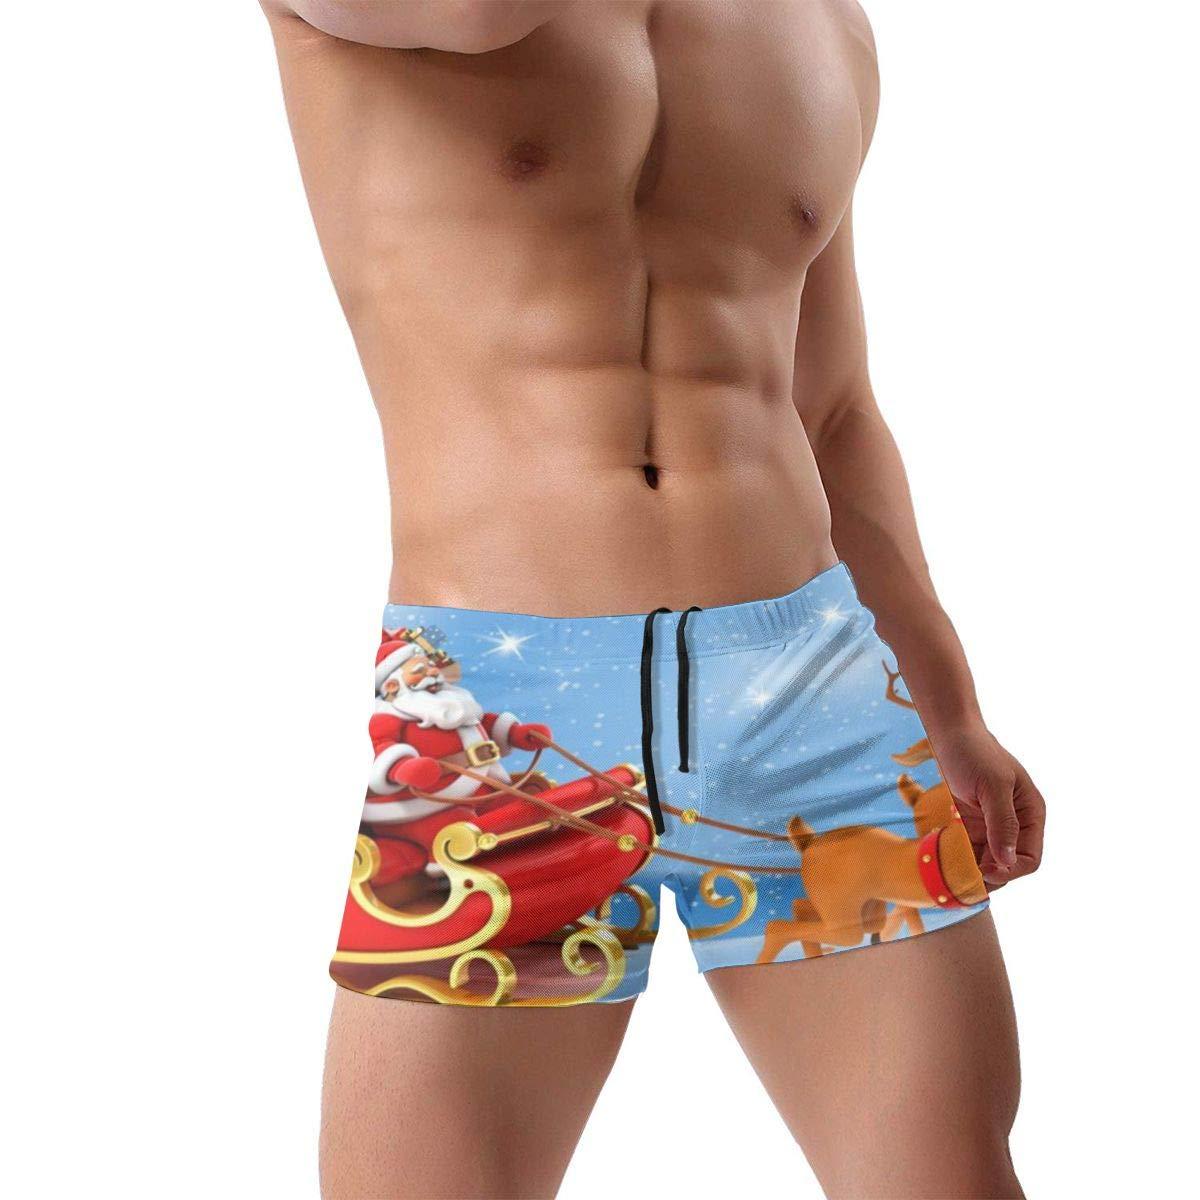 349tg1u Santa Sleigh Mens Swim Trunks Shorts Athletic Swimwear Briefs Boardshorts